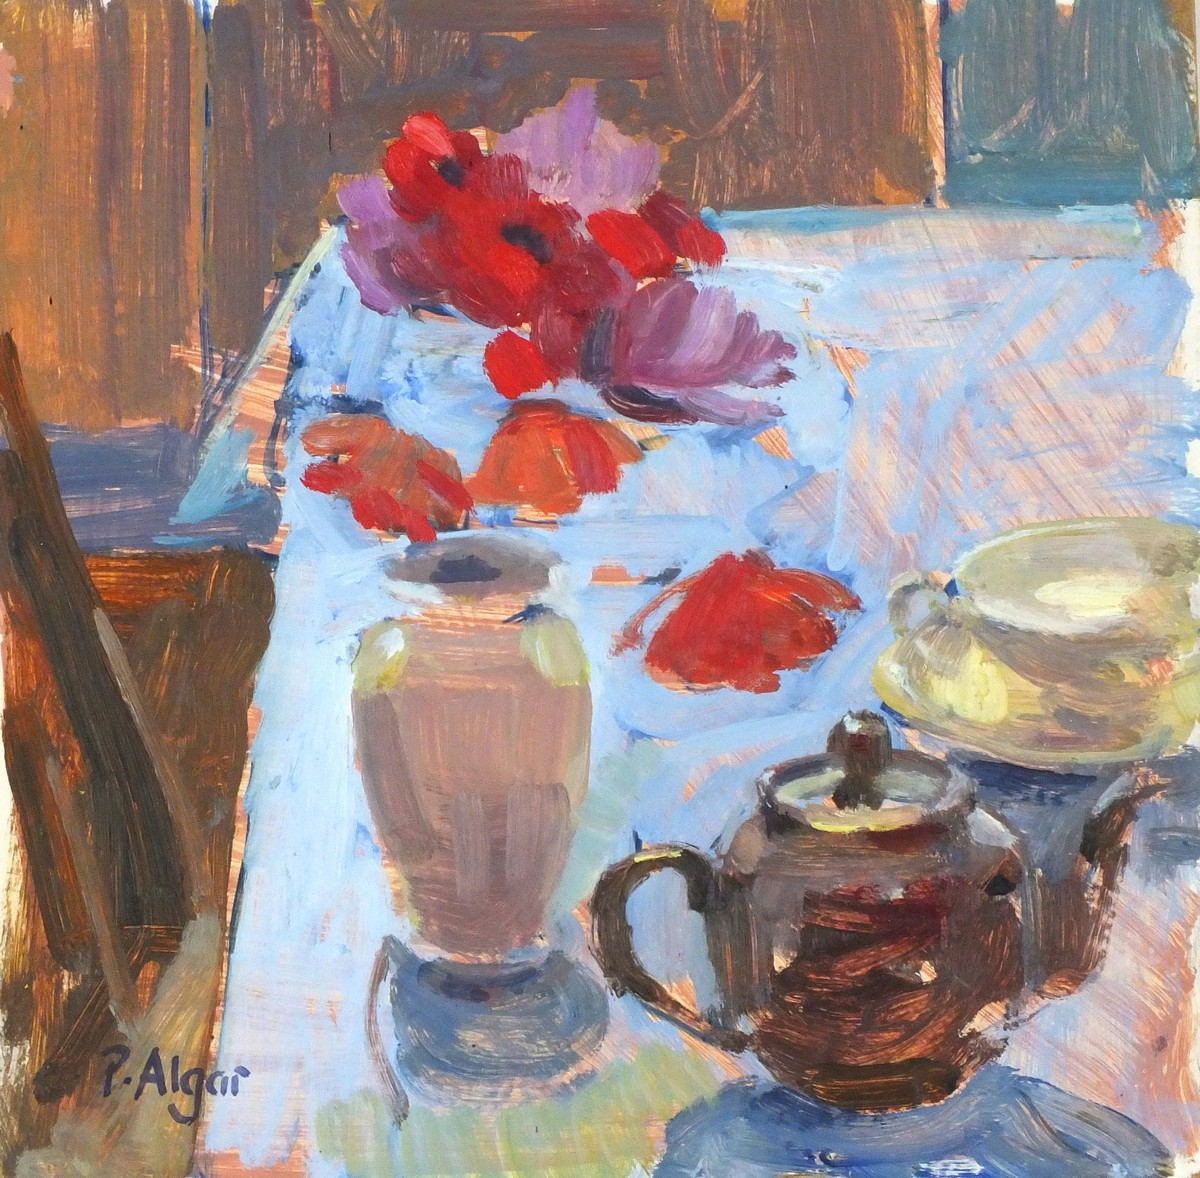 Lot 34 - Pat ALGAR (1937-2013), Oil on board, Still life - vase of poppies & tea pot on a kitchen table,